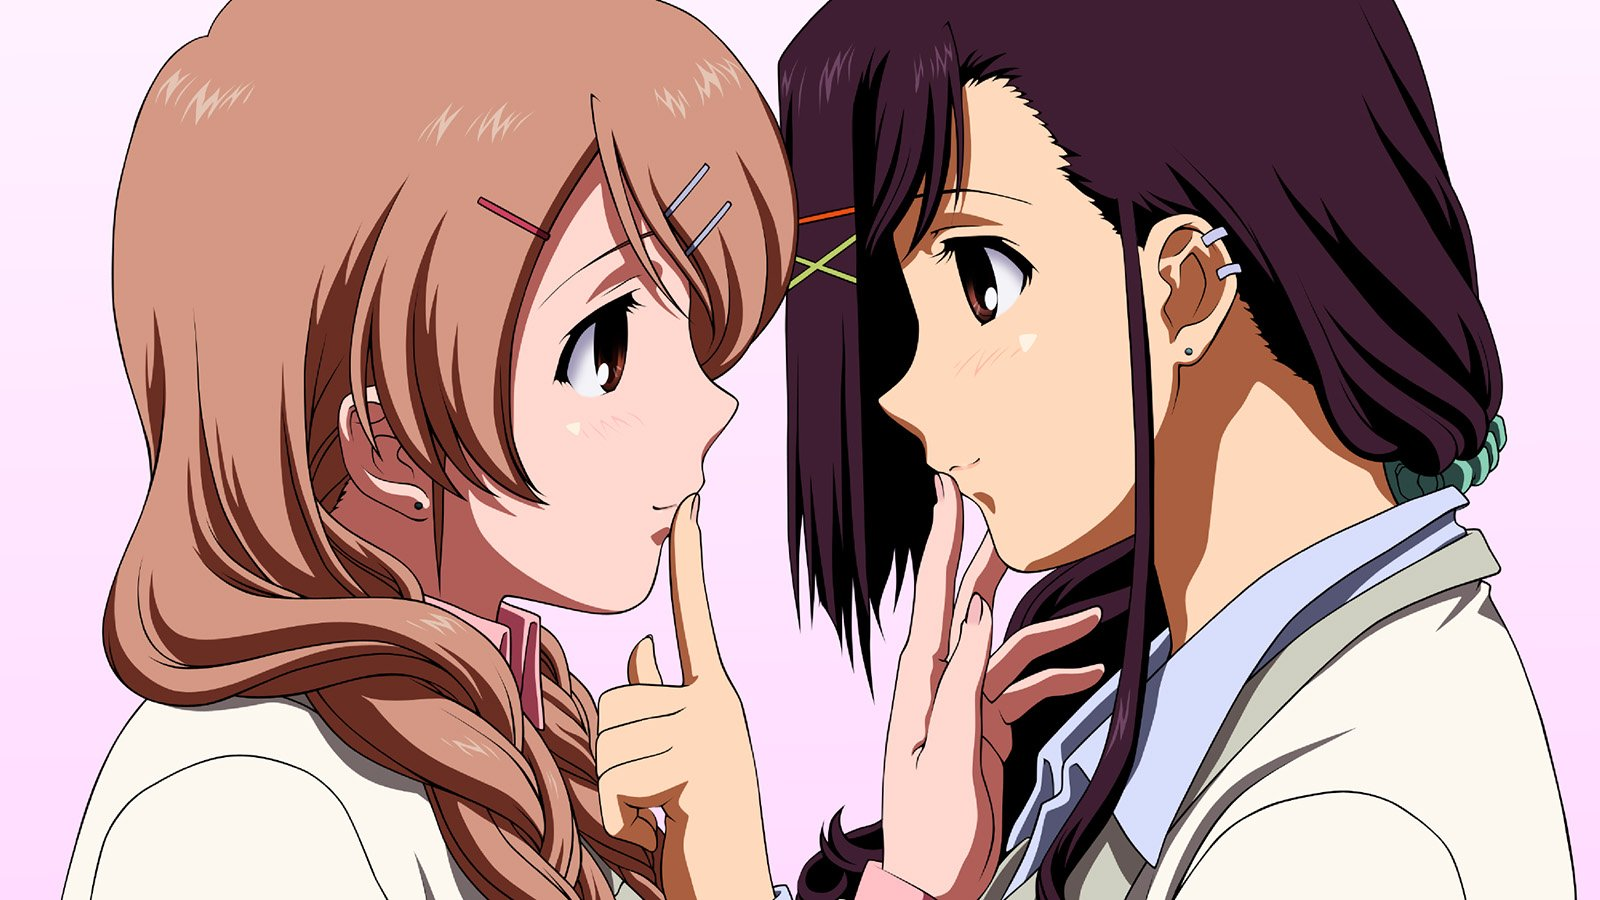 Top 20 Best Yuri Anime Series